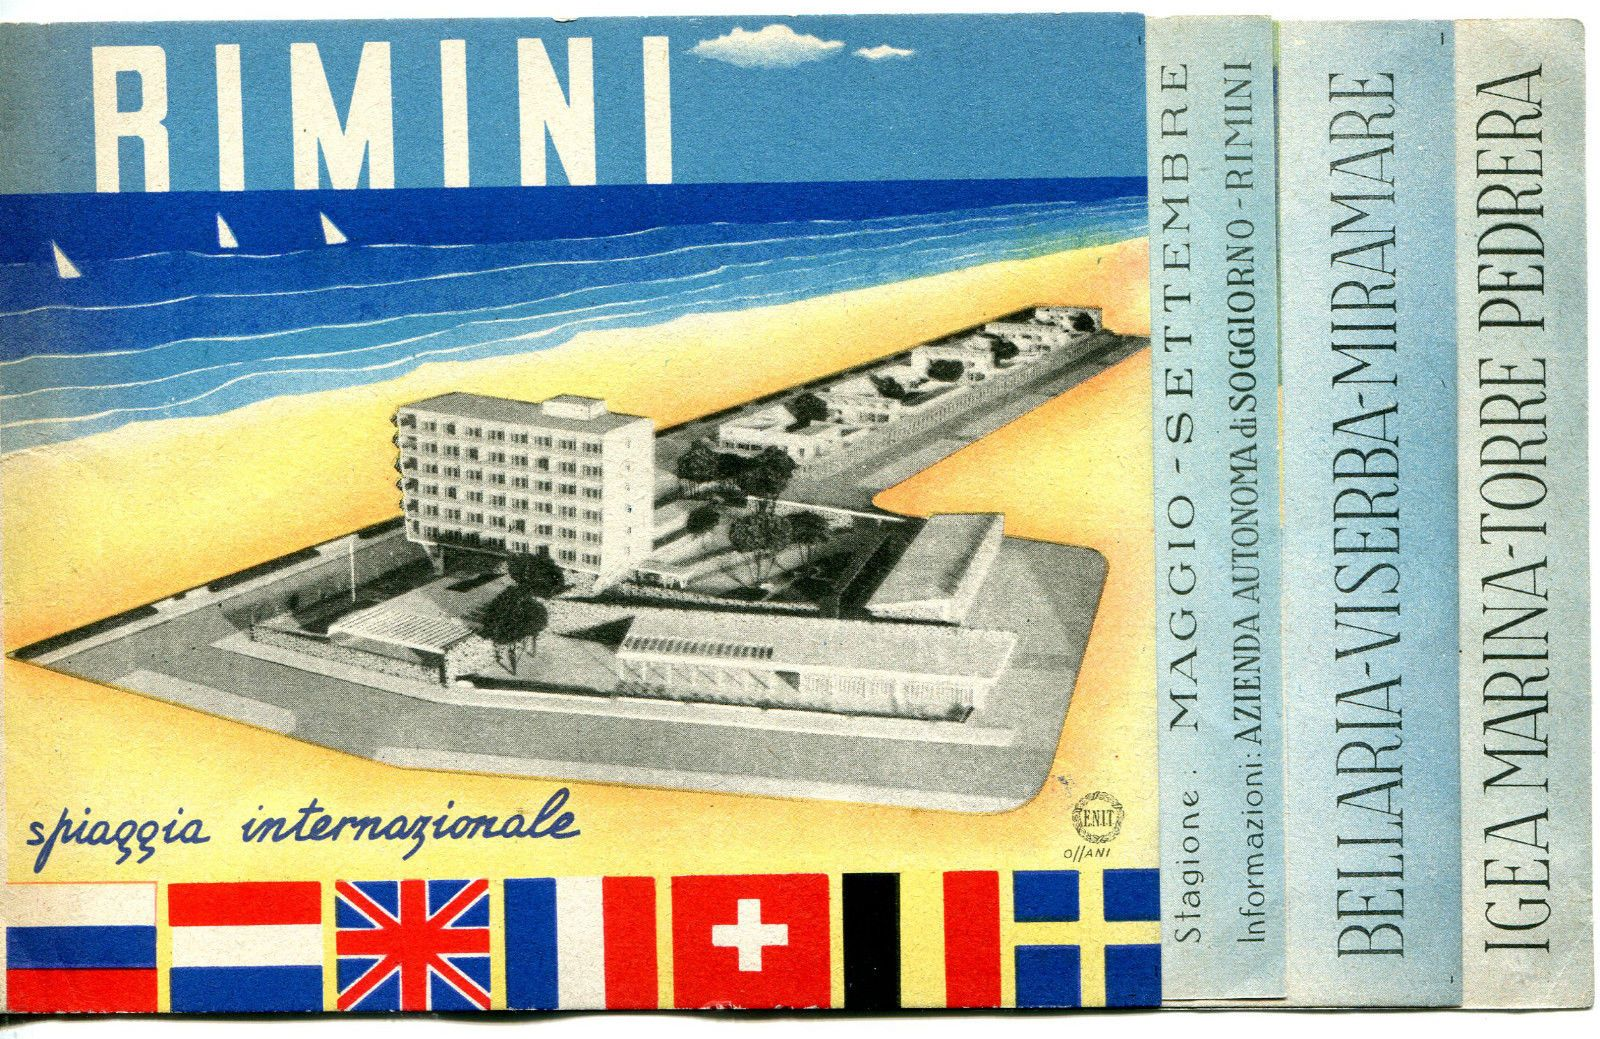 Details zu DEPLIANT,1948,OSSANI,RIMINI SPIAGGIA INTERNAZIONALE,IGEA ...